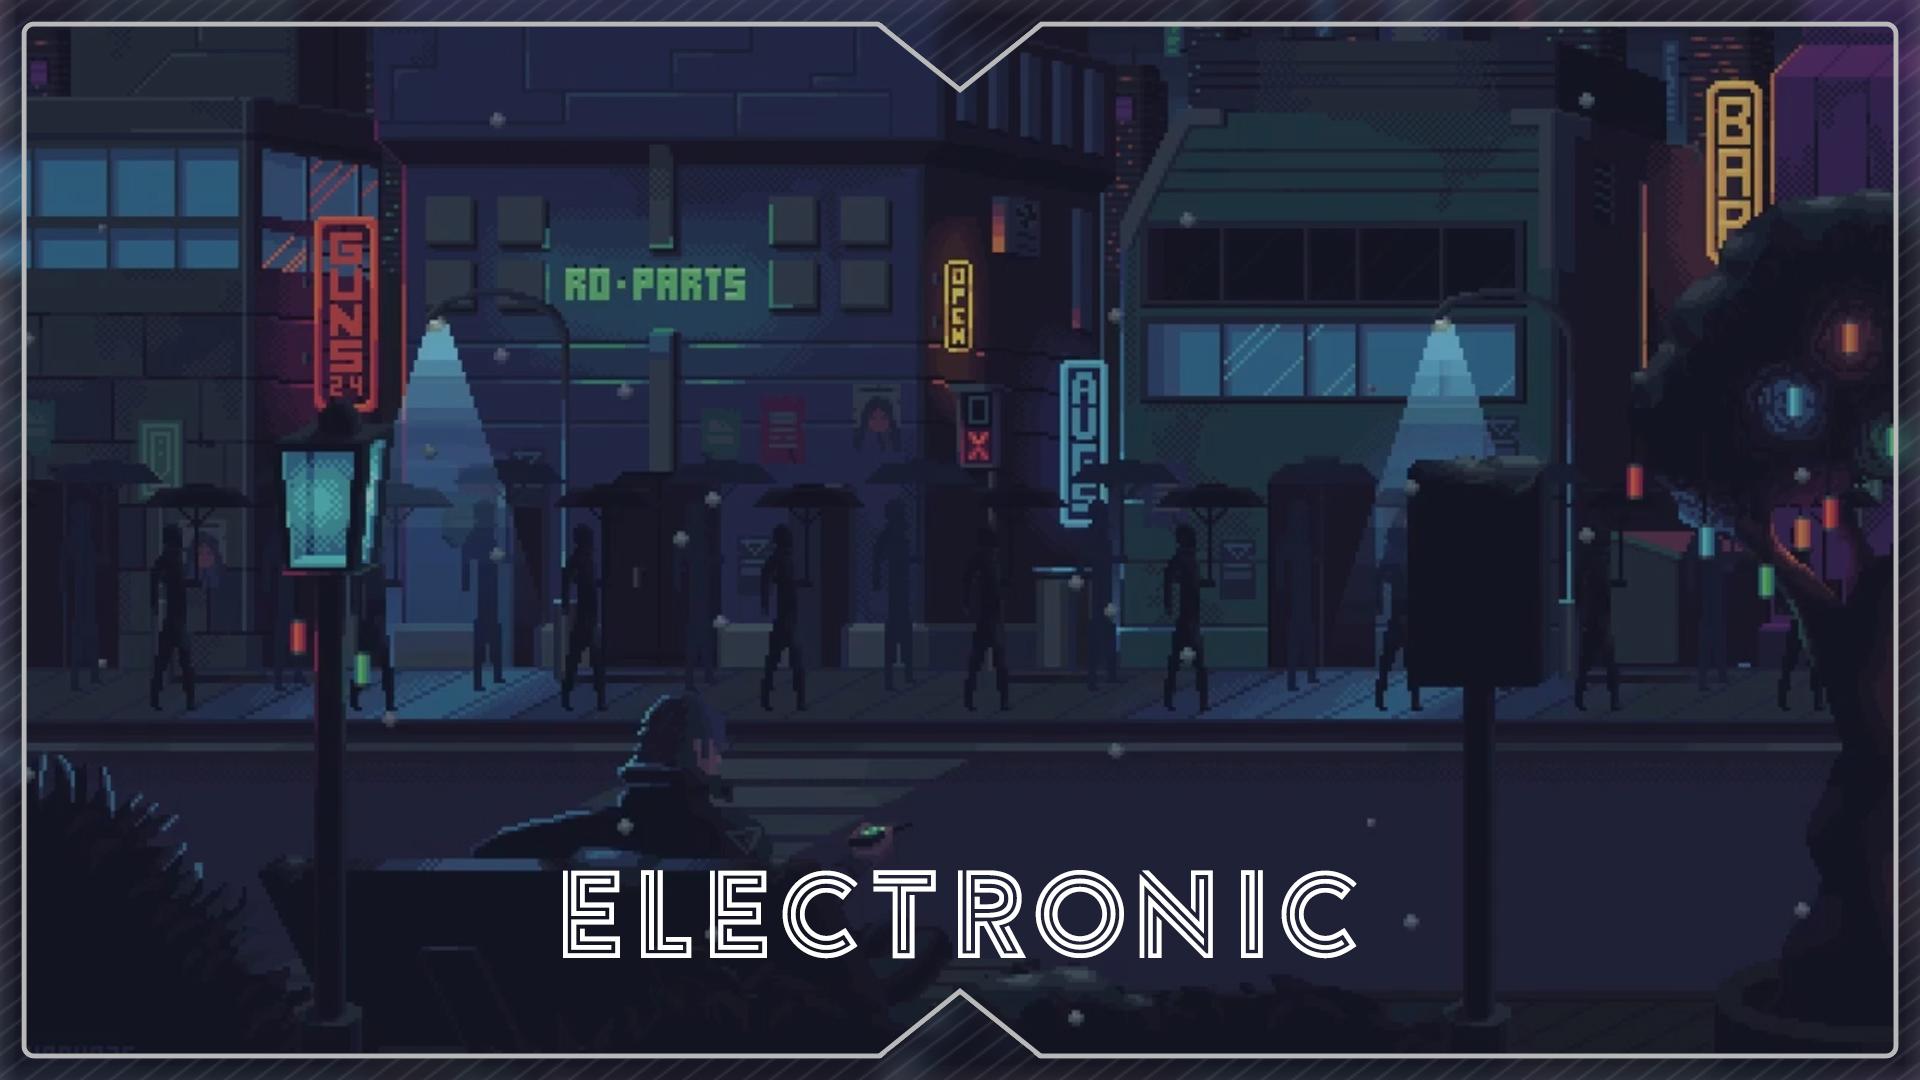 Video Wallpaper Engine Pixel Street Night Animated